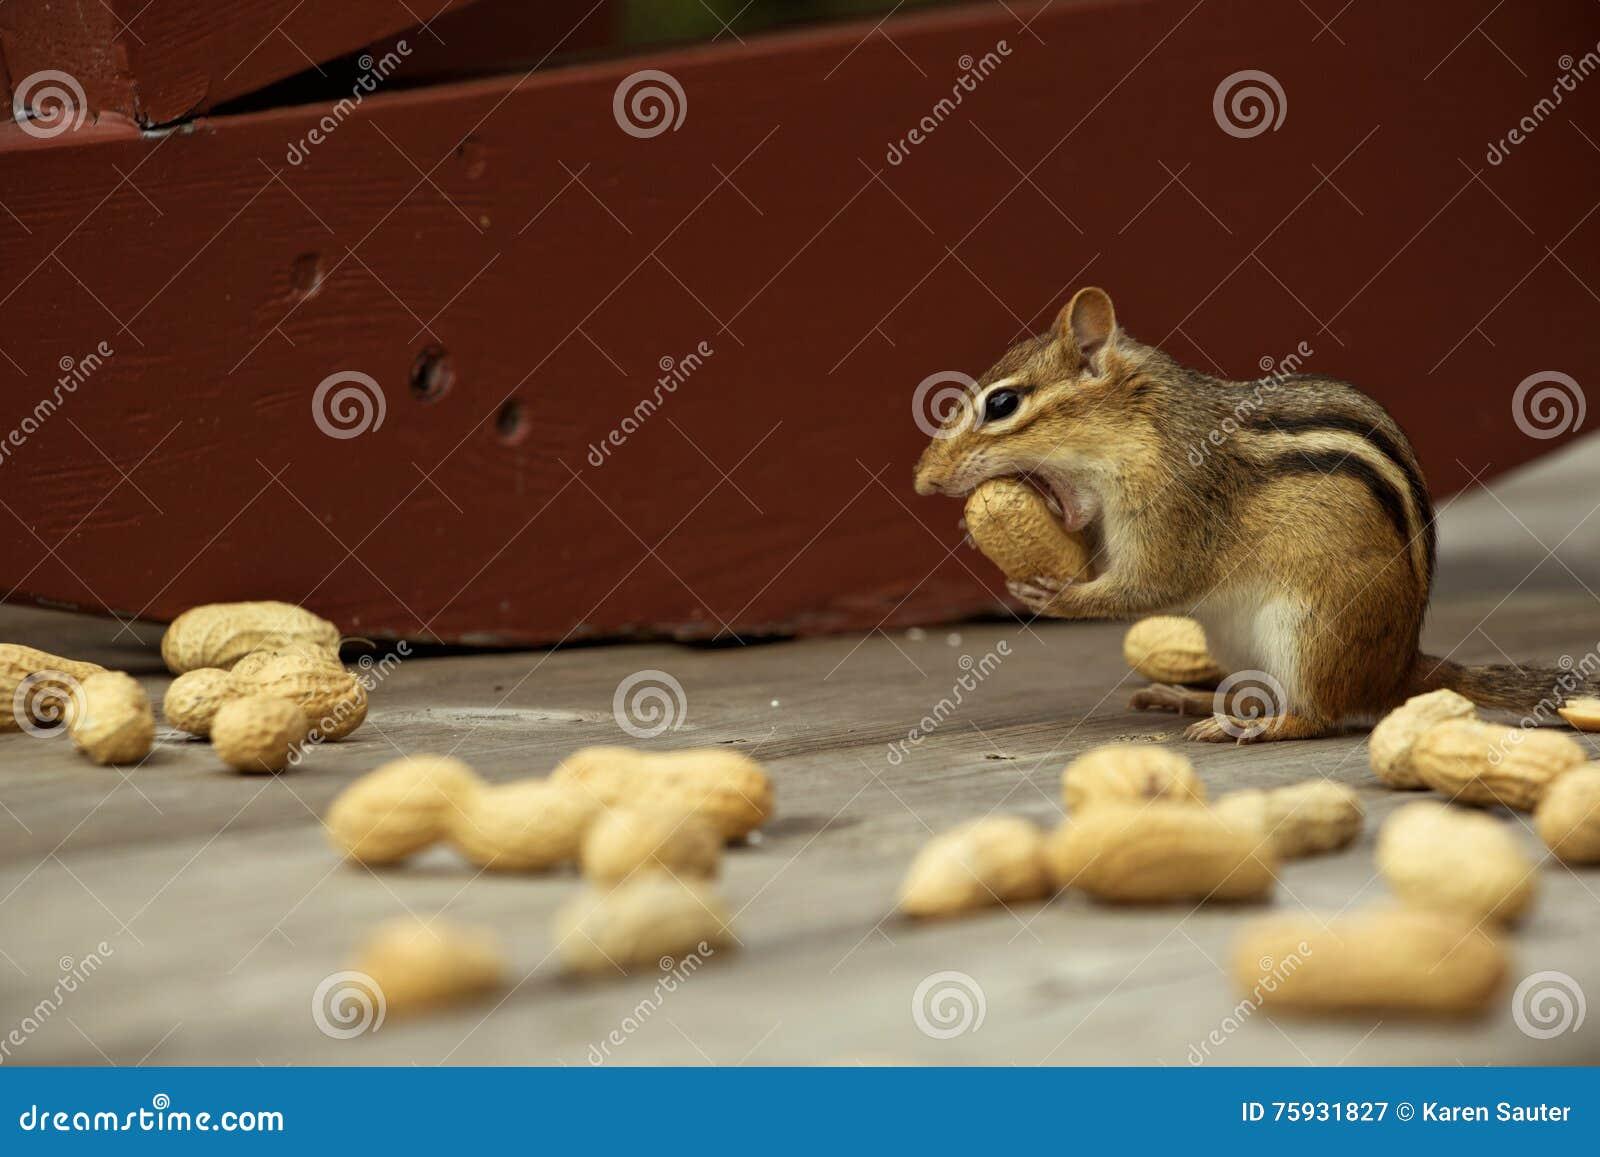 Small chipmunk taking a big bite.